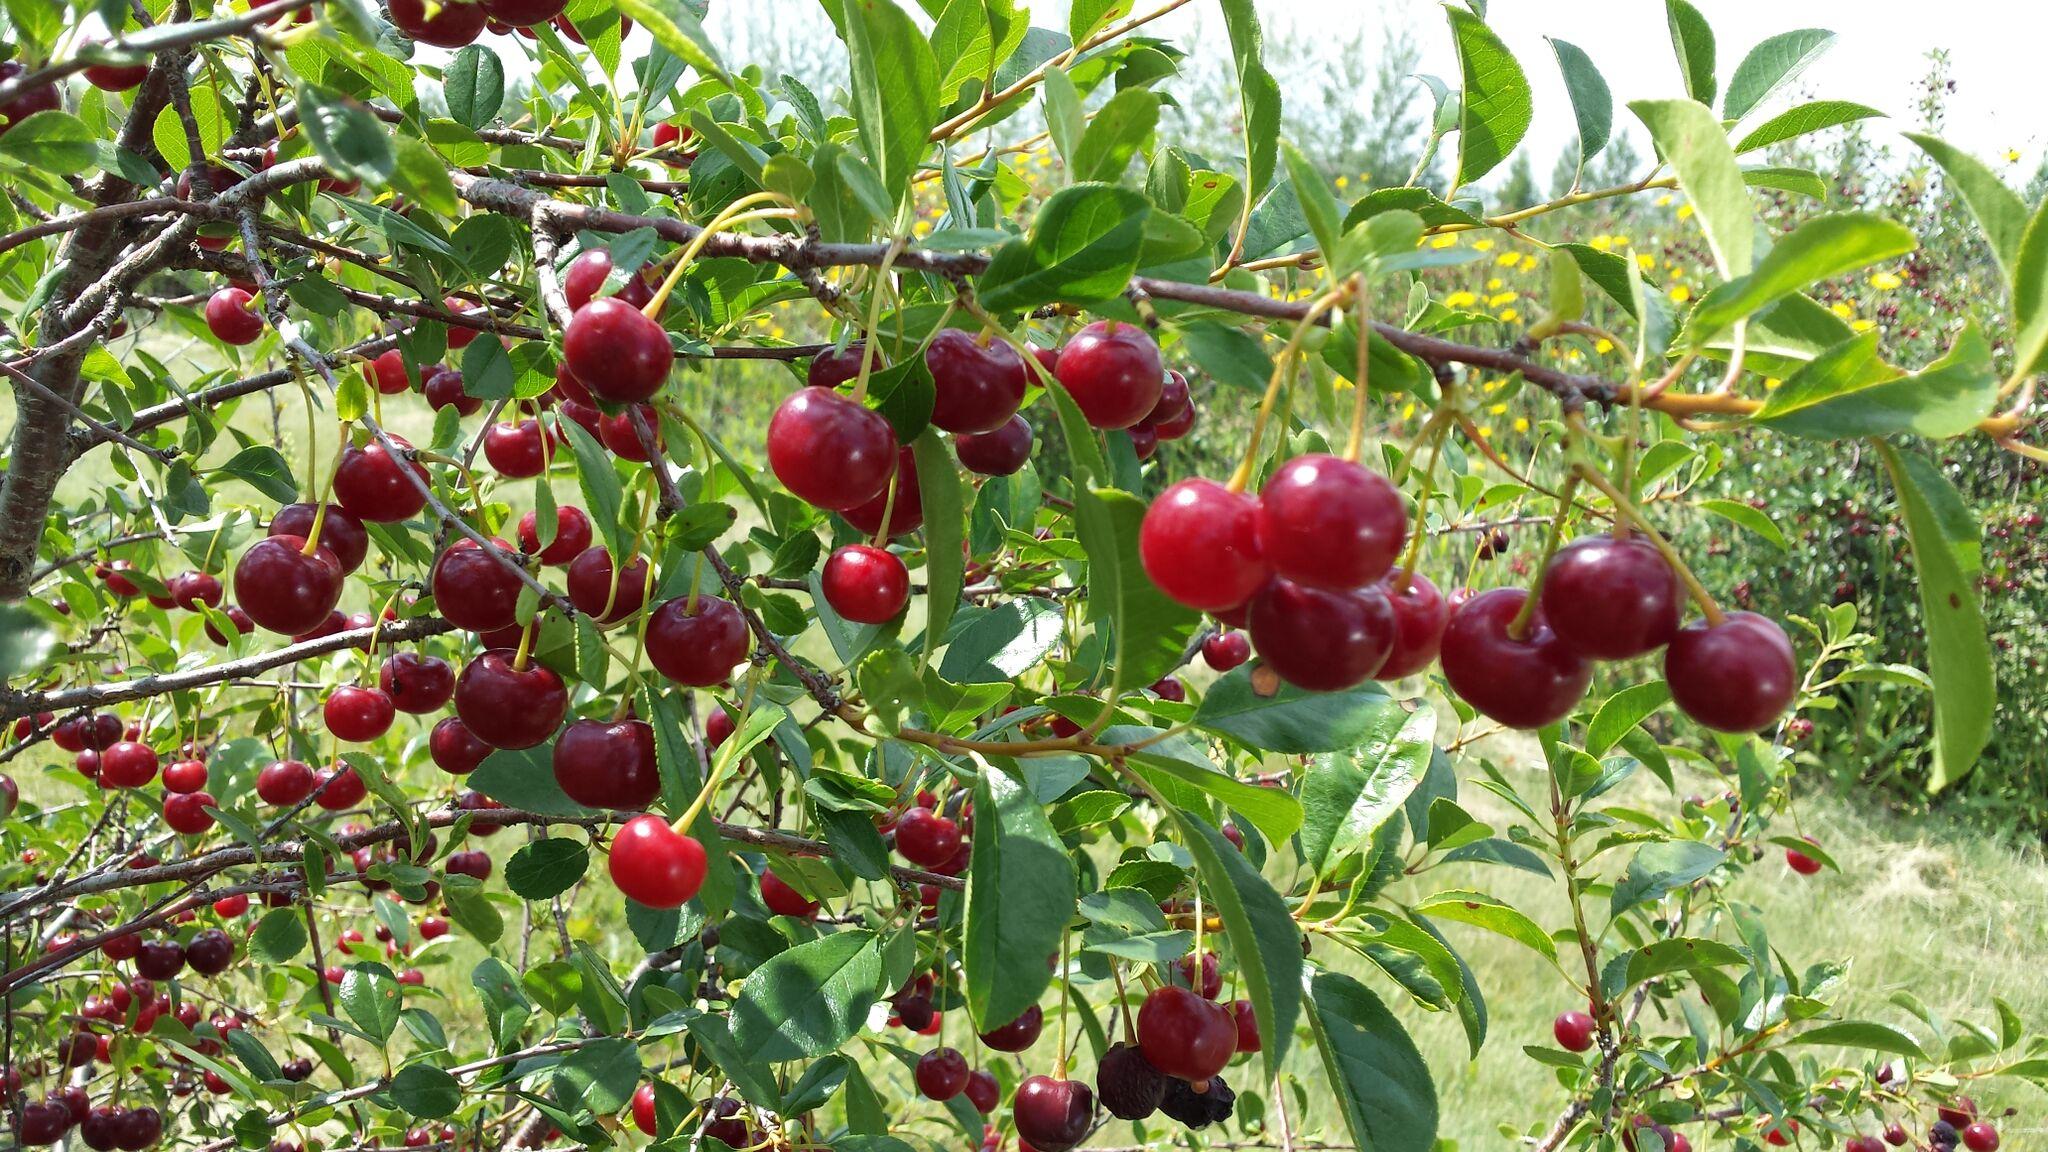 Cherries on the branch.jpg